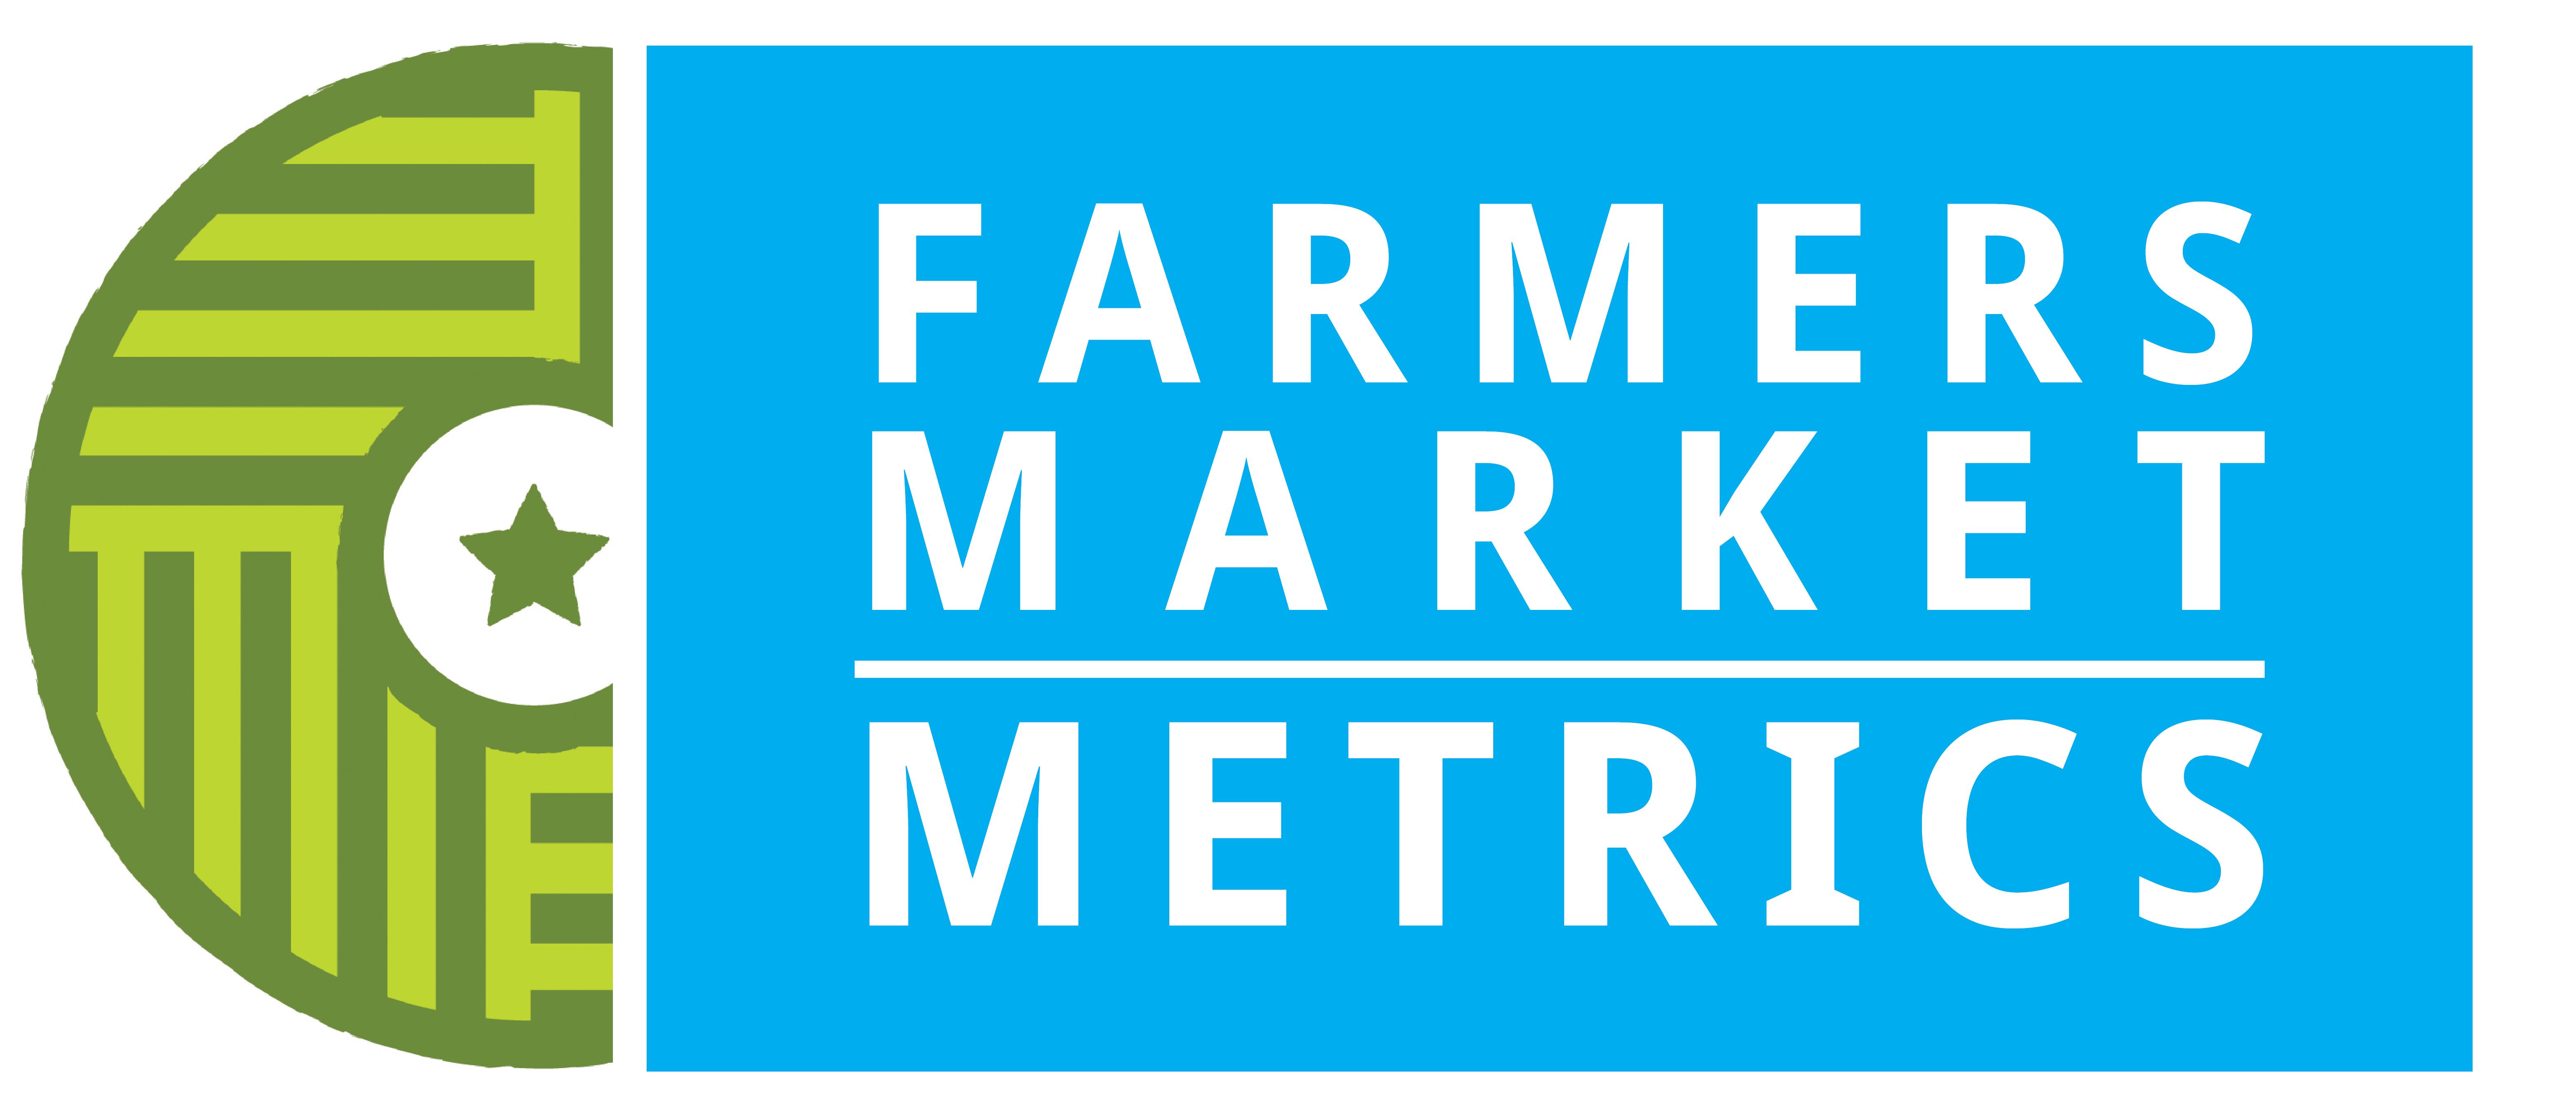 Farmers Market Metrics Guide